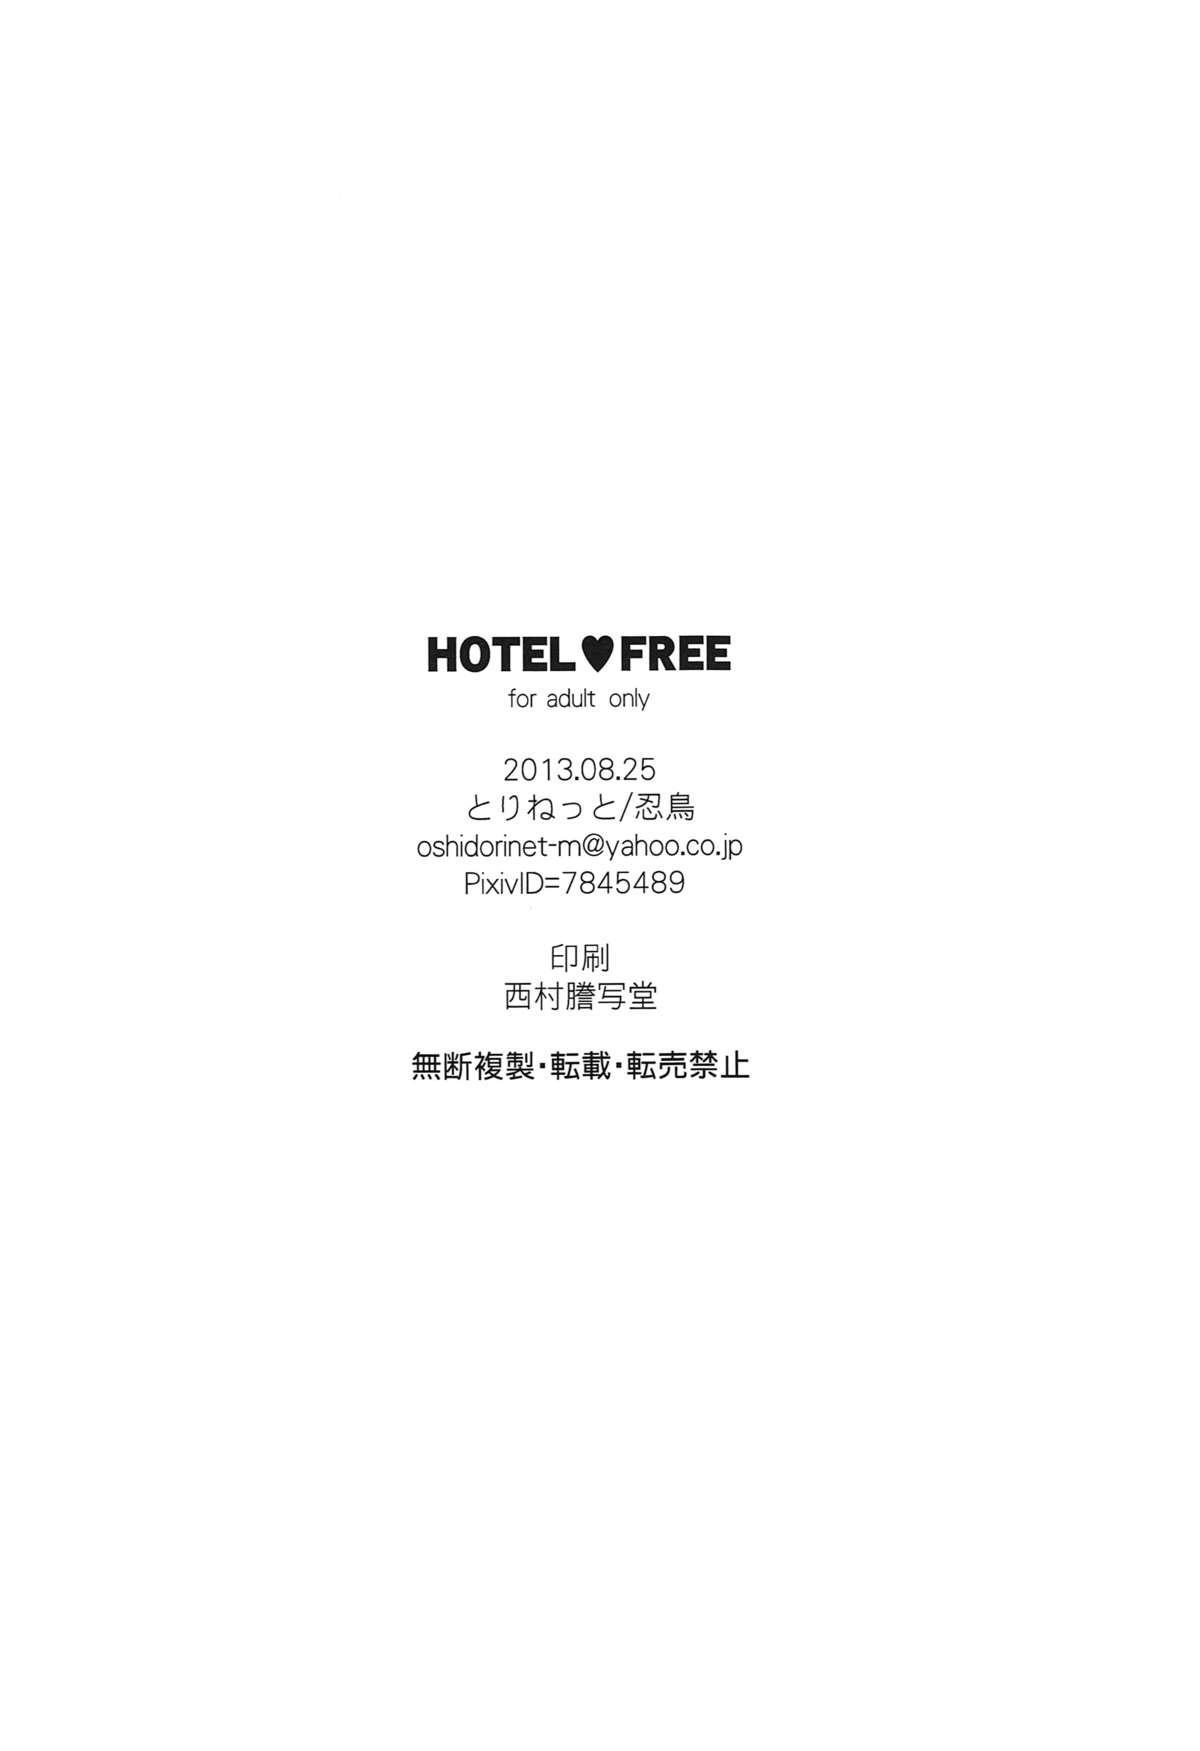 HOTEL FREE 20